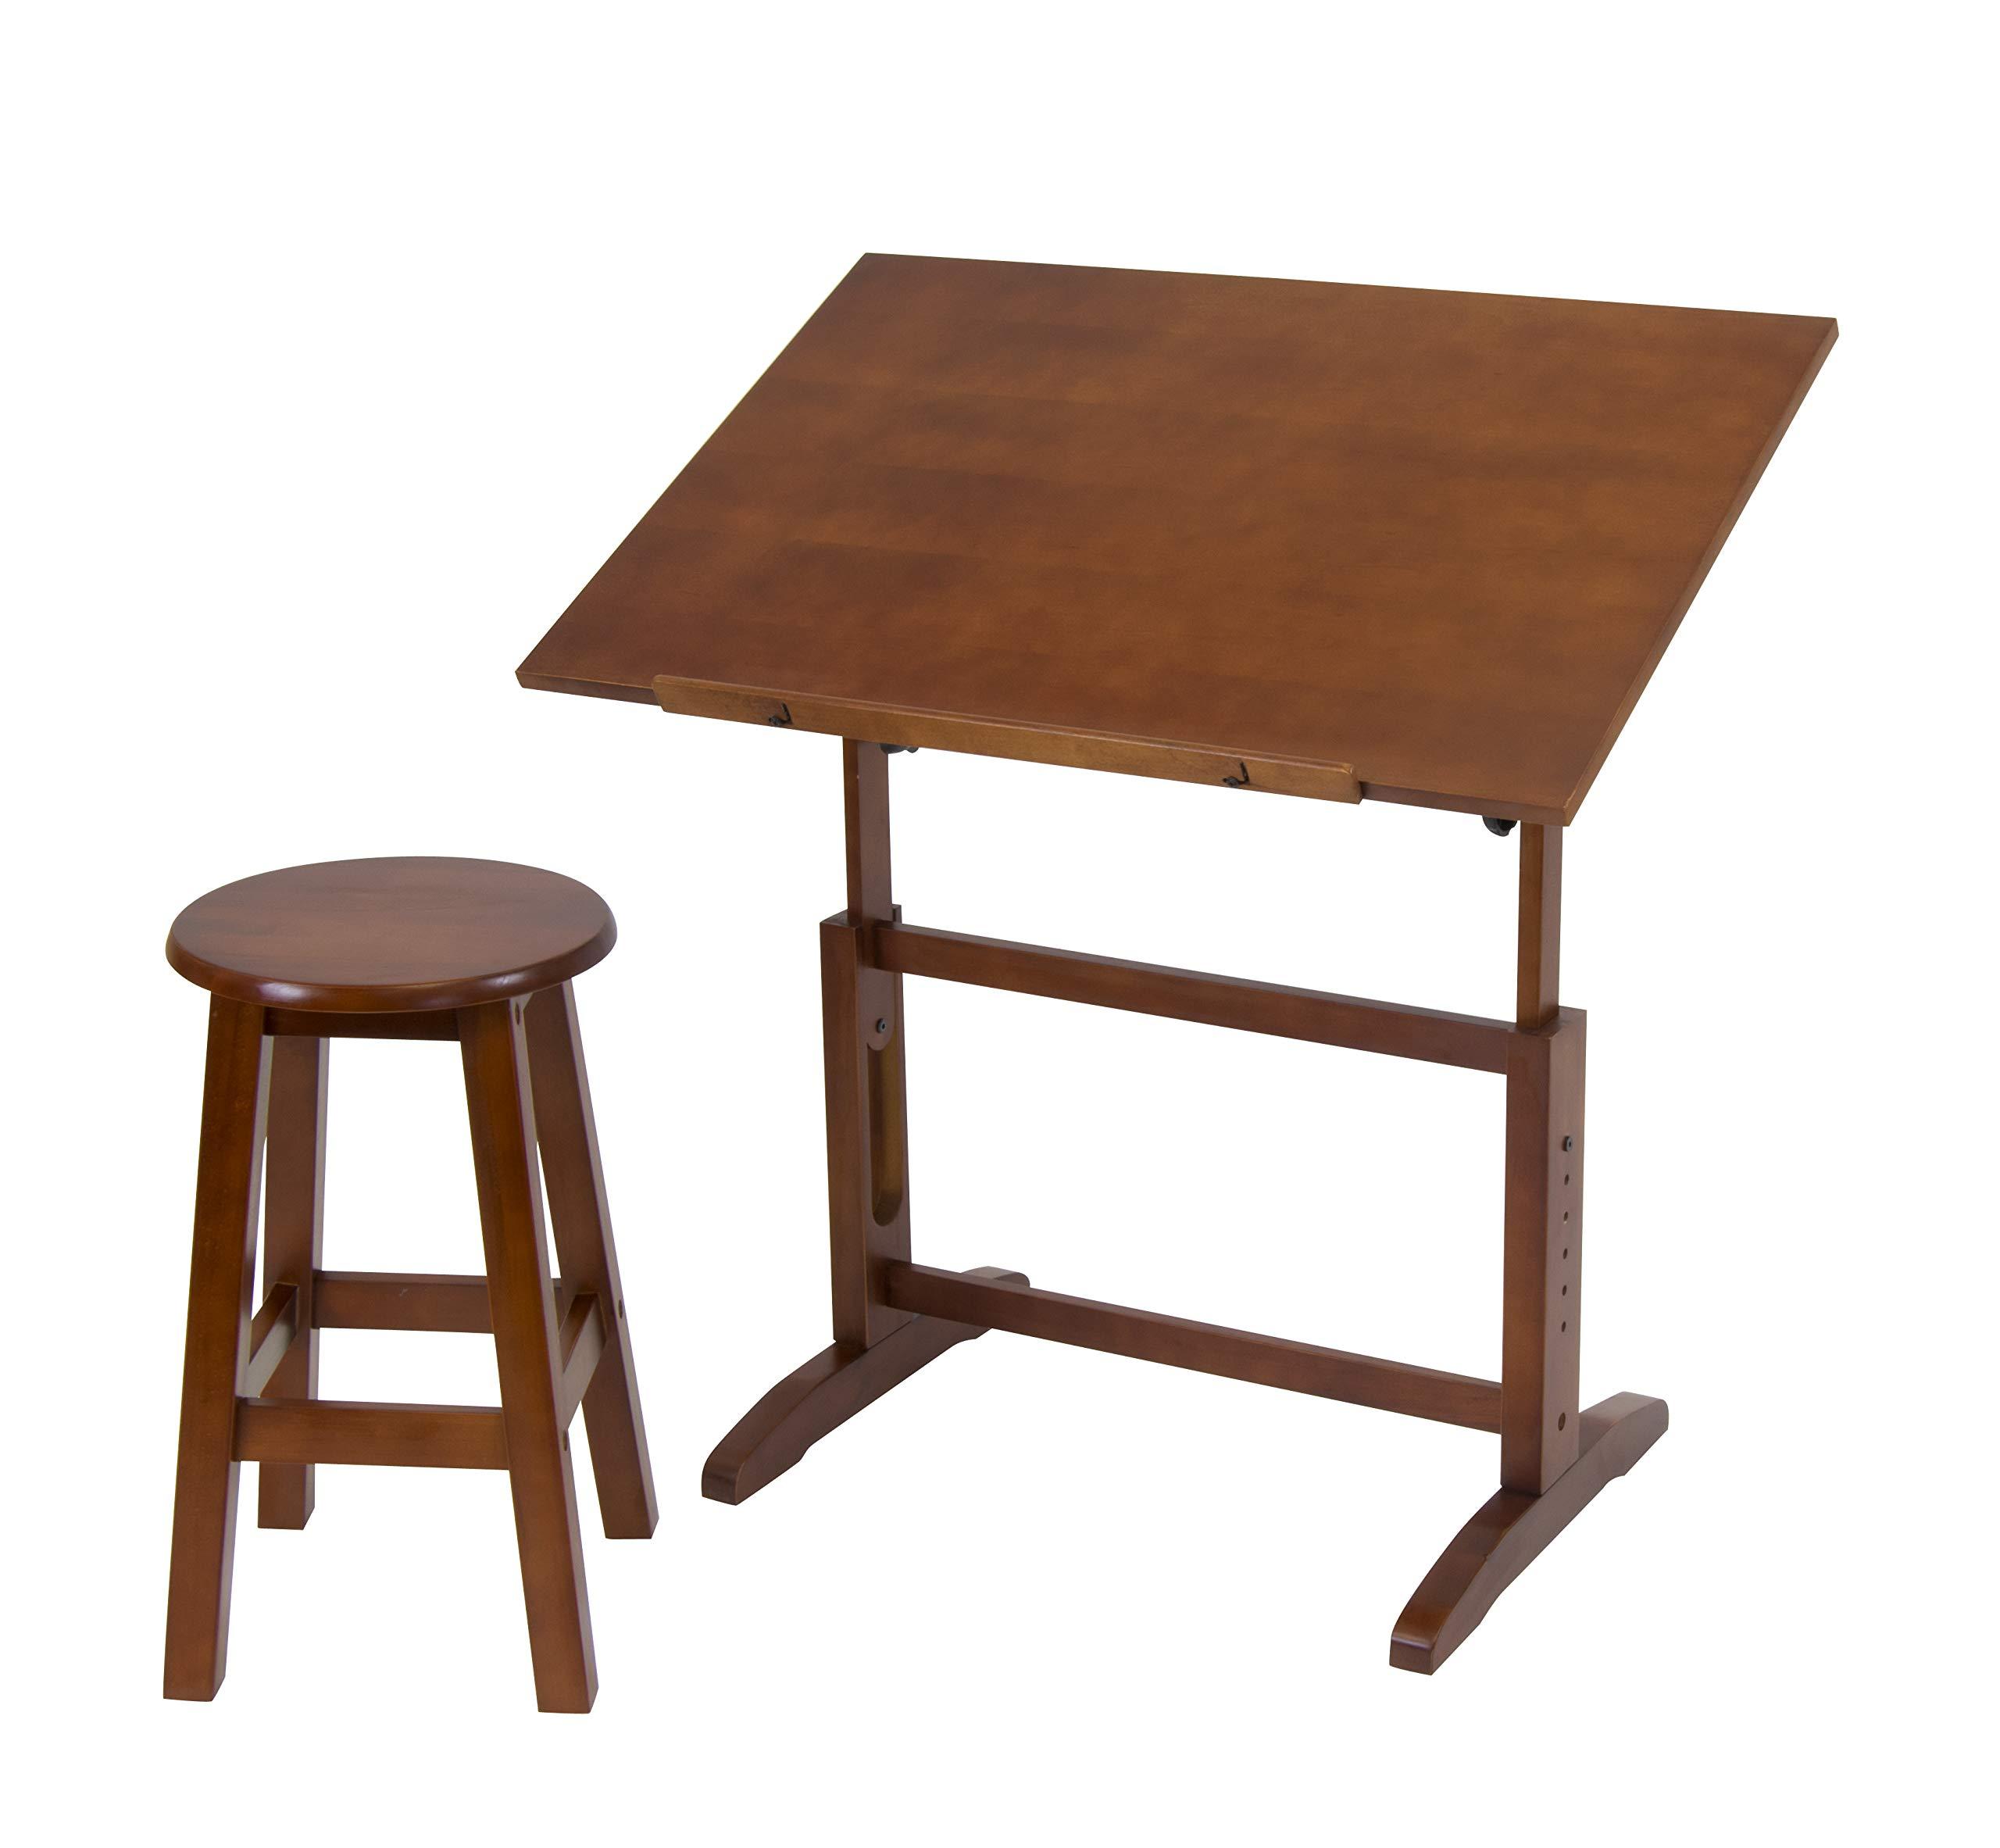 Studio Designs 13257 Creative Table and Stool Set, Walnut by SD STUDIO DESIGNS